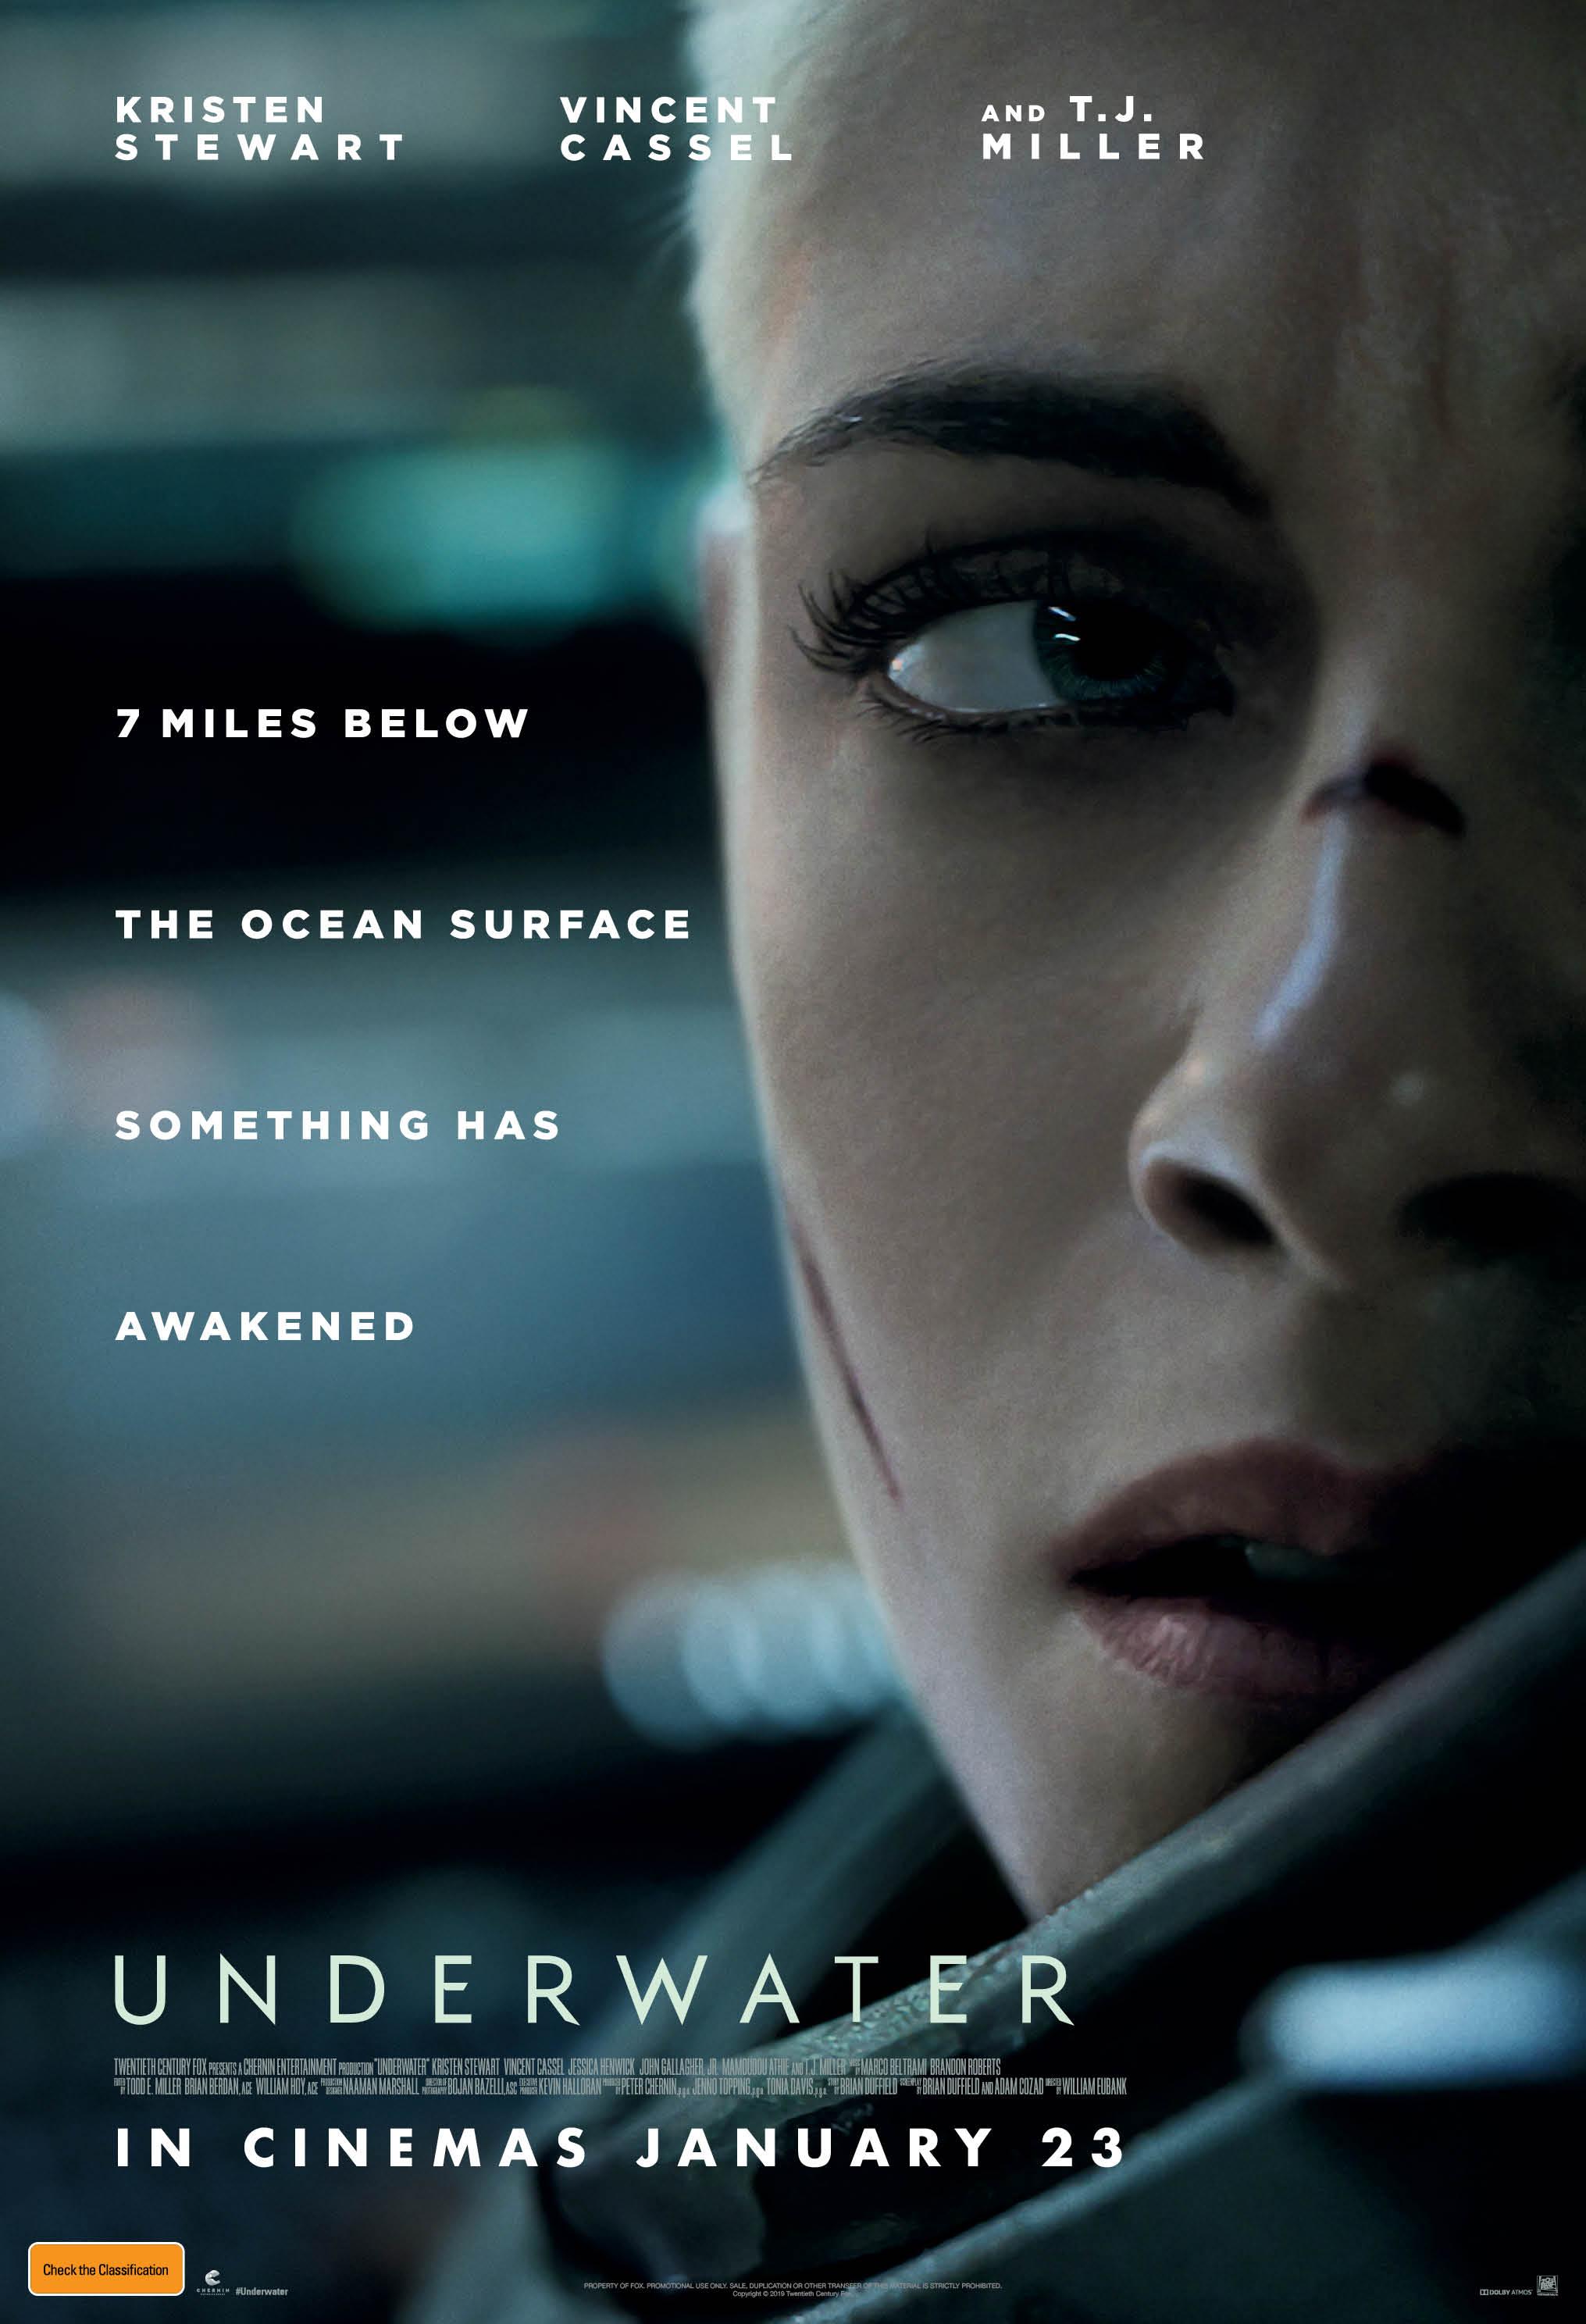 Underwater_Poster_Jan 23